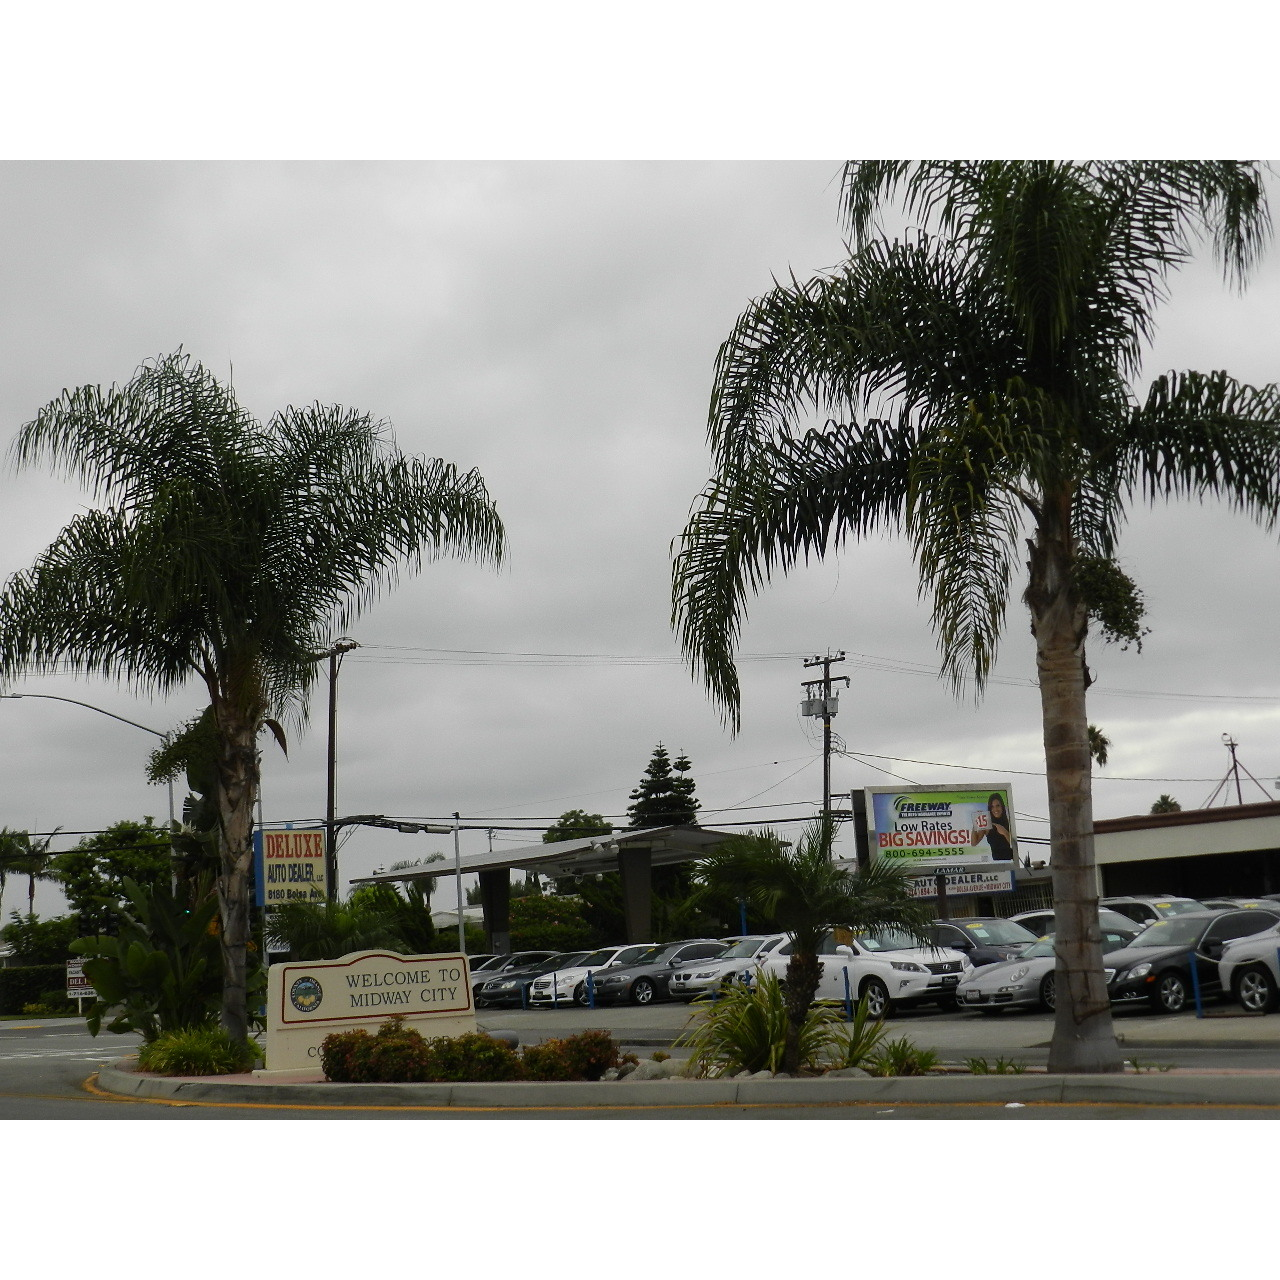 Deluxe Auto Dealer 8122 Bolsa Ave Midway City, CA Auto